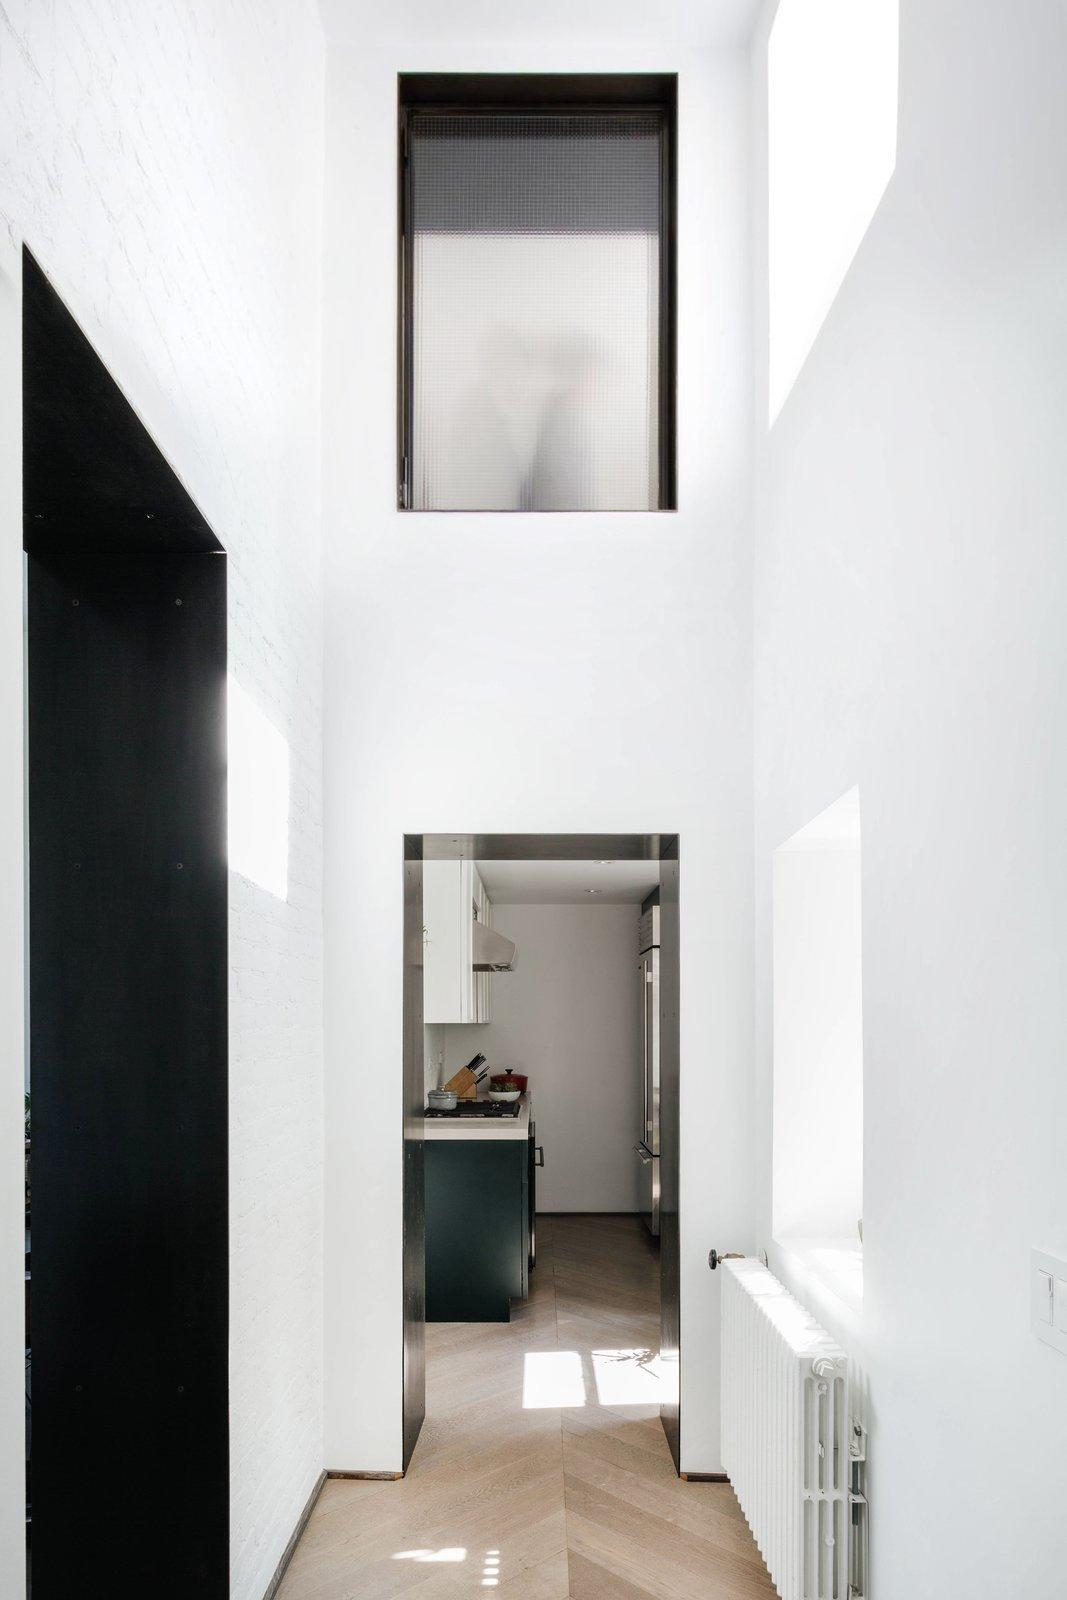 Dinding yang menjulang tinggi membuat ilusi ruangan terasa luas (Sumber: dwell.com)